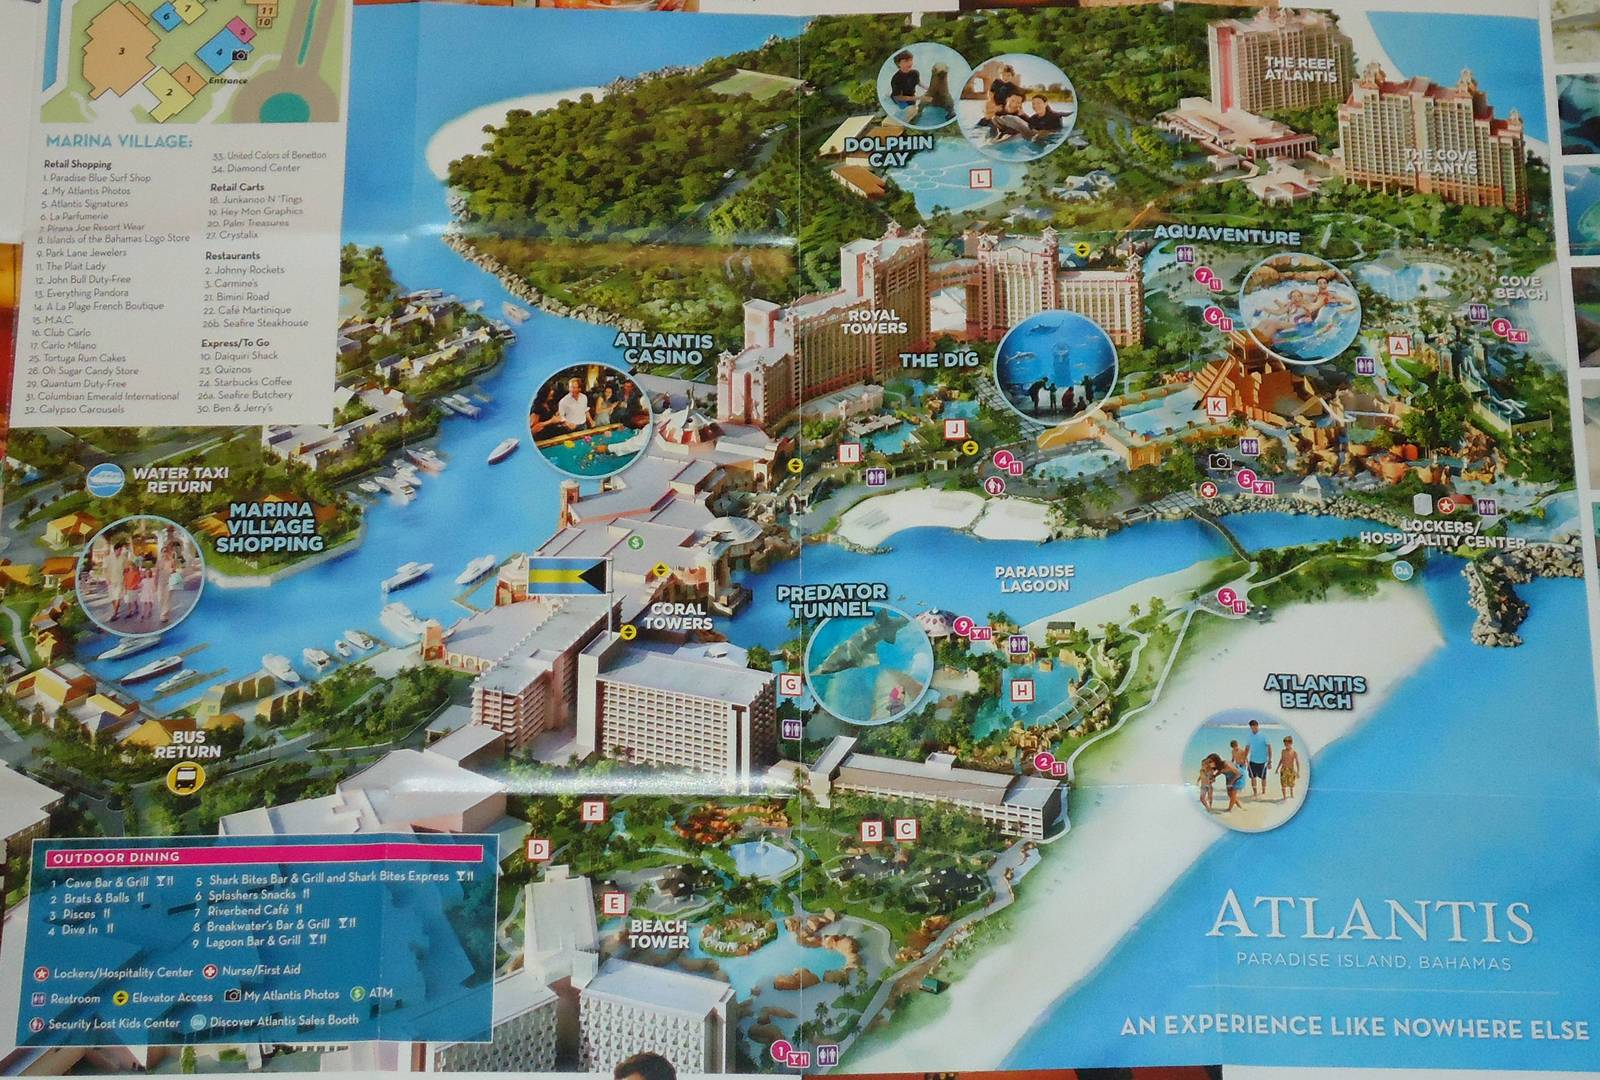 map of paradise island bahamas Brand New Atlantis Water Park Map And 50 Similar Items map of paradise island bahamas